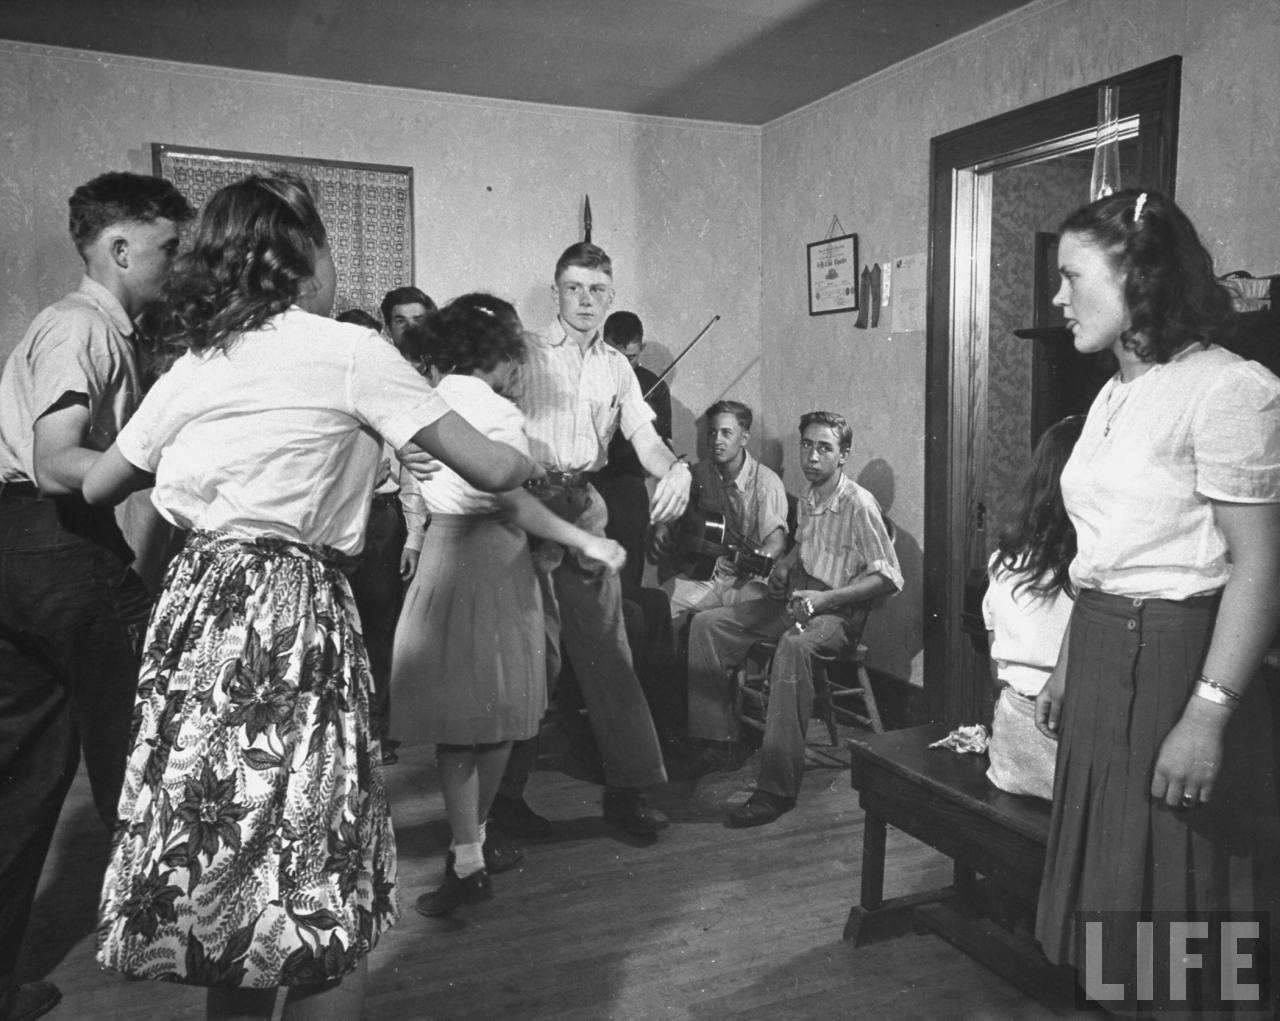 Kansas Farm Boy, Dan Gardner (center) at 4-H square dance.